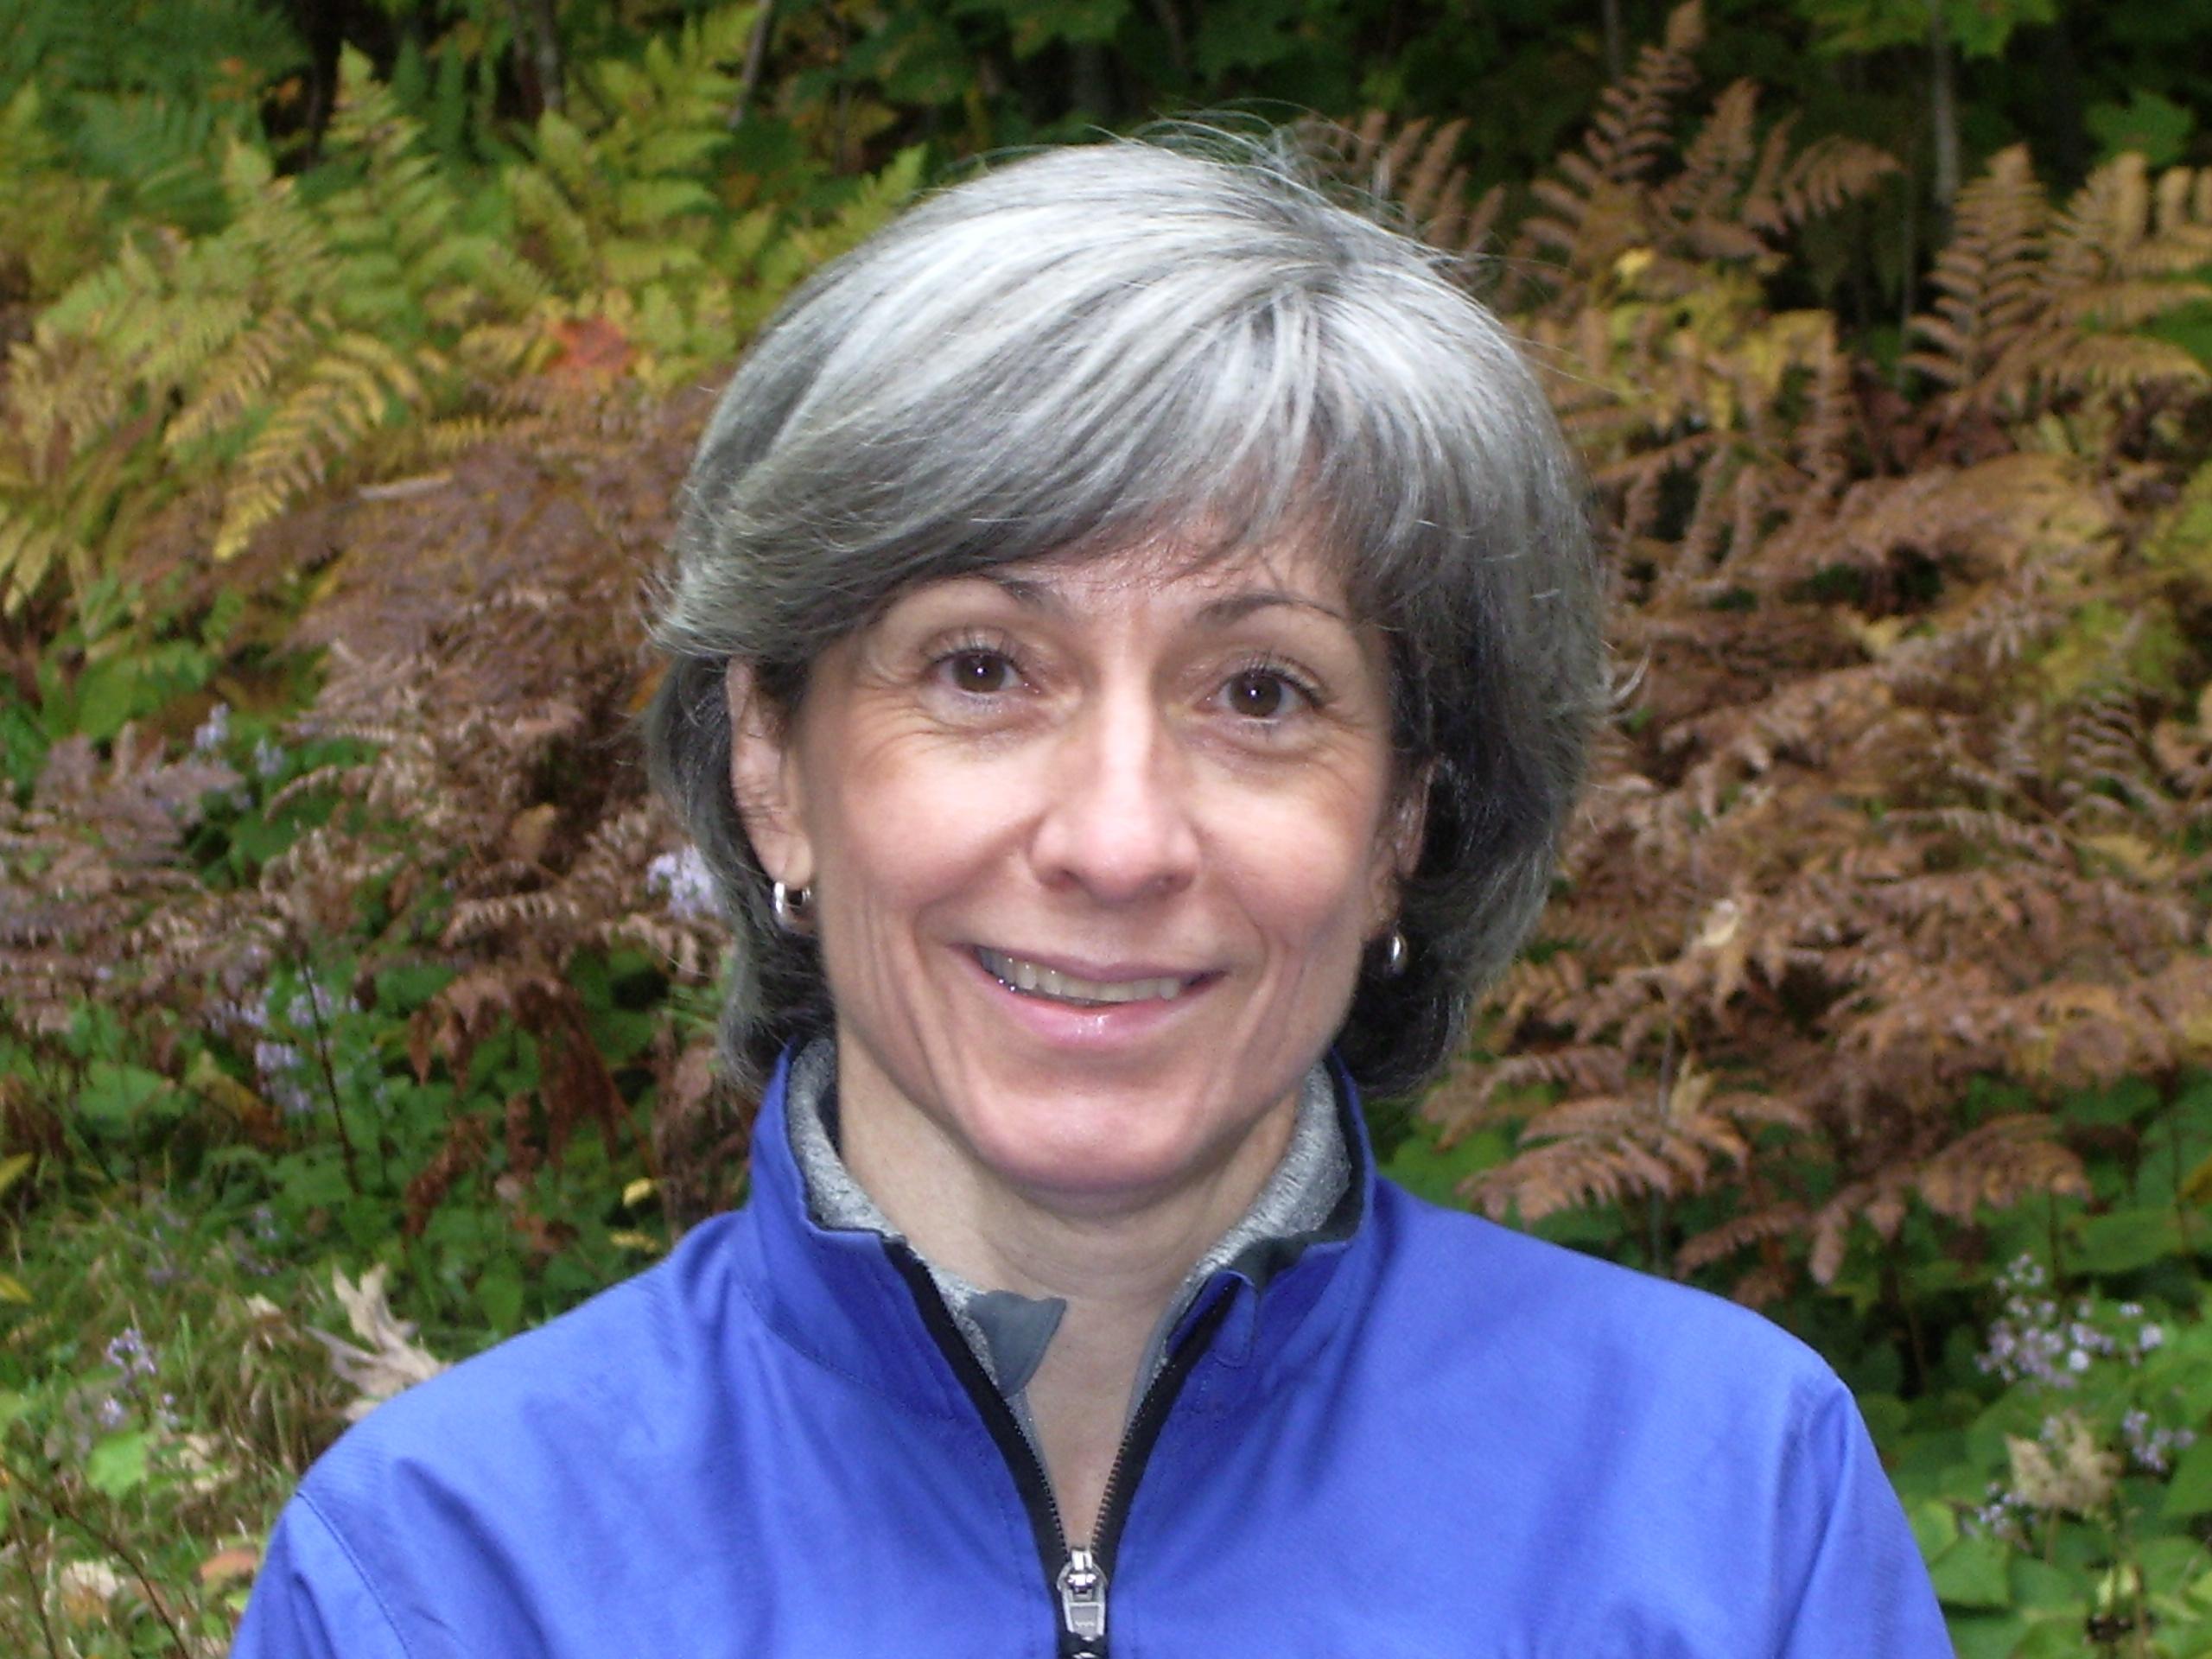 Rachel Thibeault